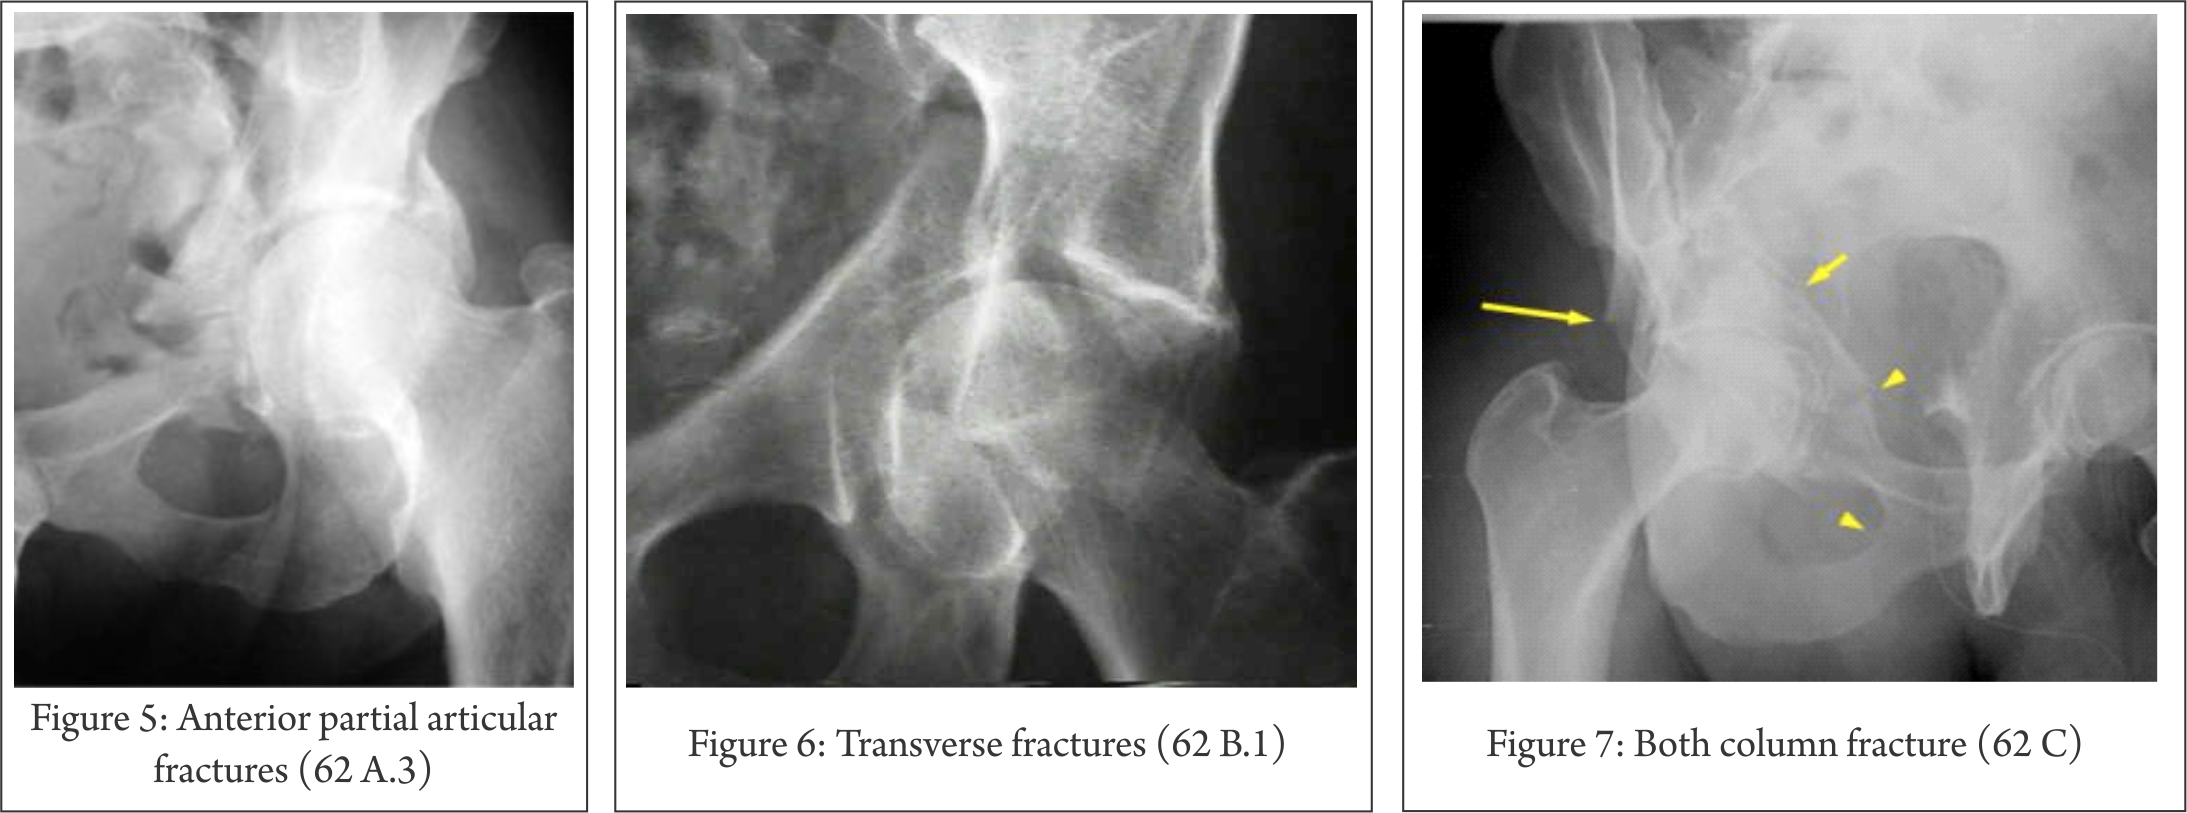 Xray clipart xray broken bone. Volume issue may aug